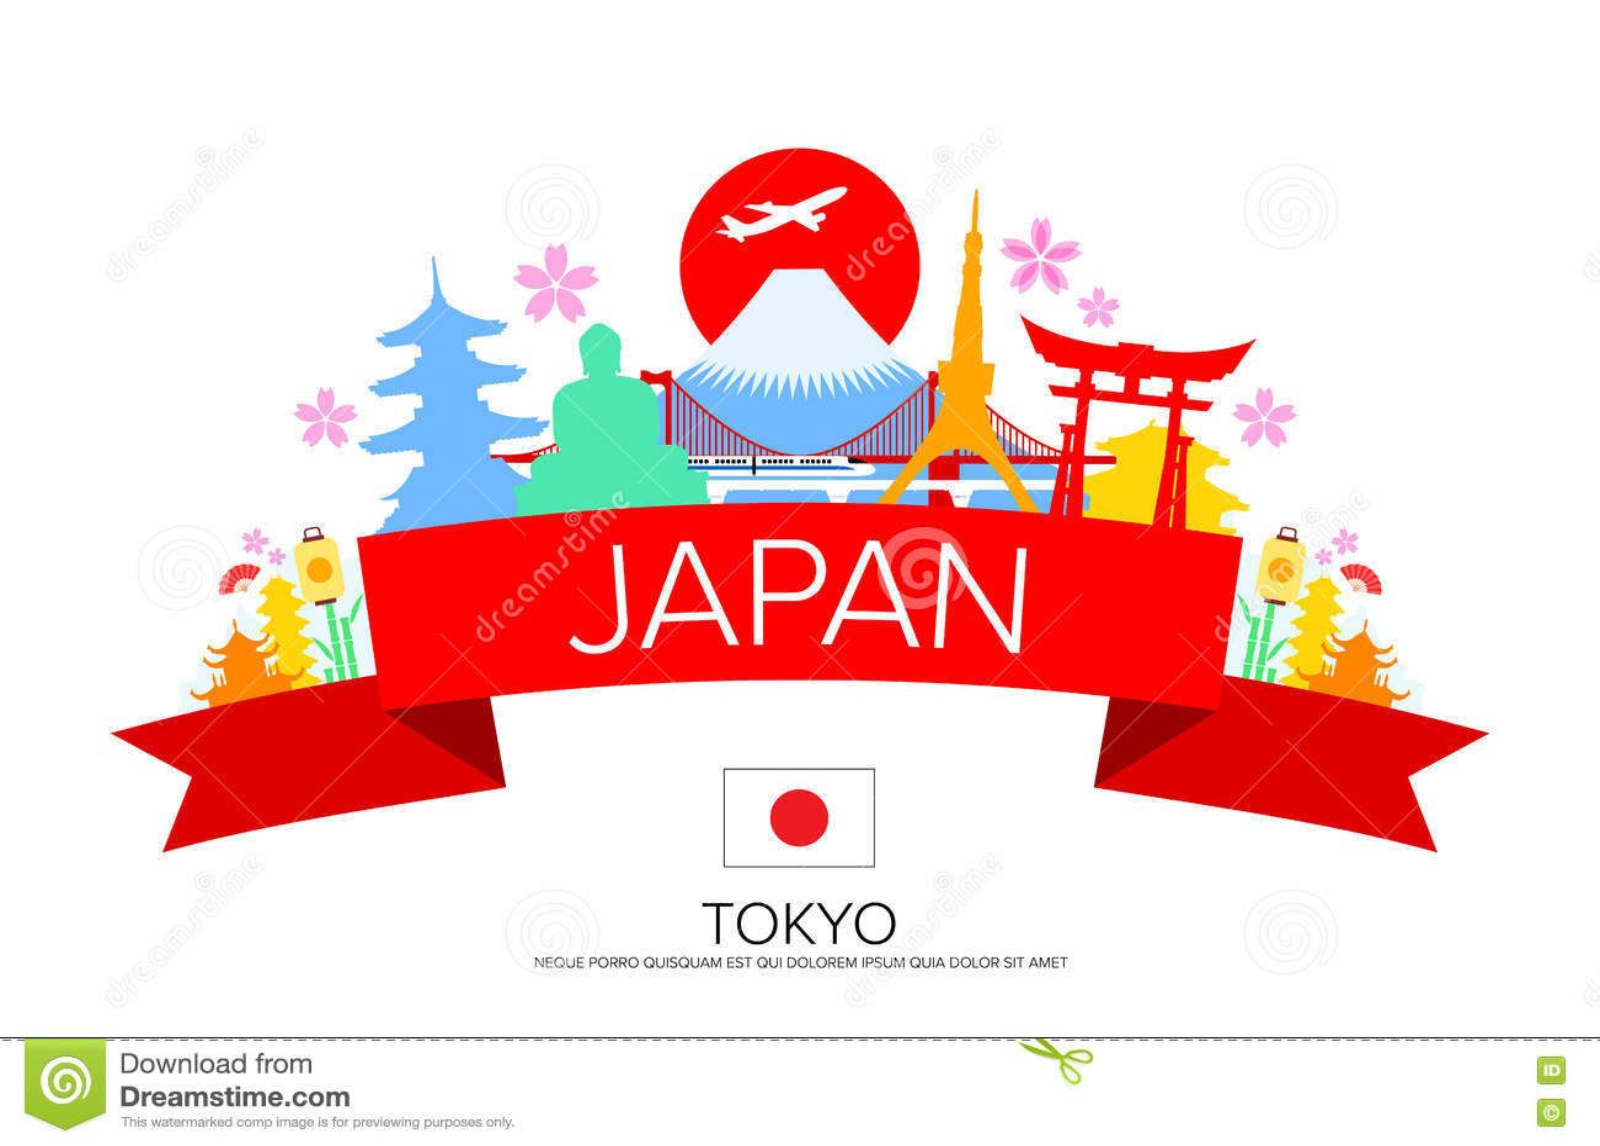 3d Fall Wallpaper Japan Tokyo Travel Landmarks Stock Vector Image 72004185